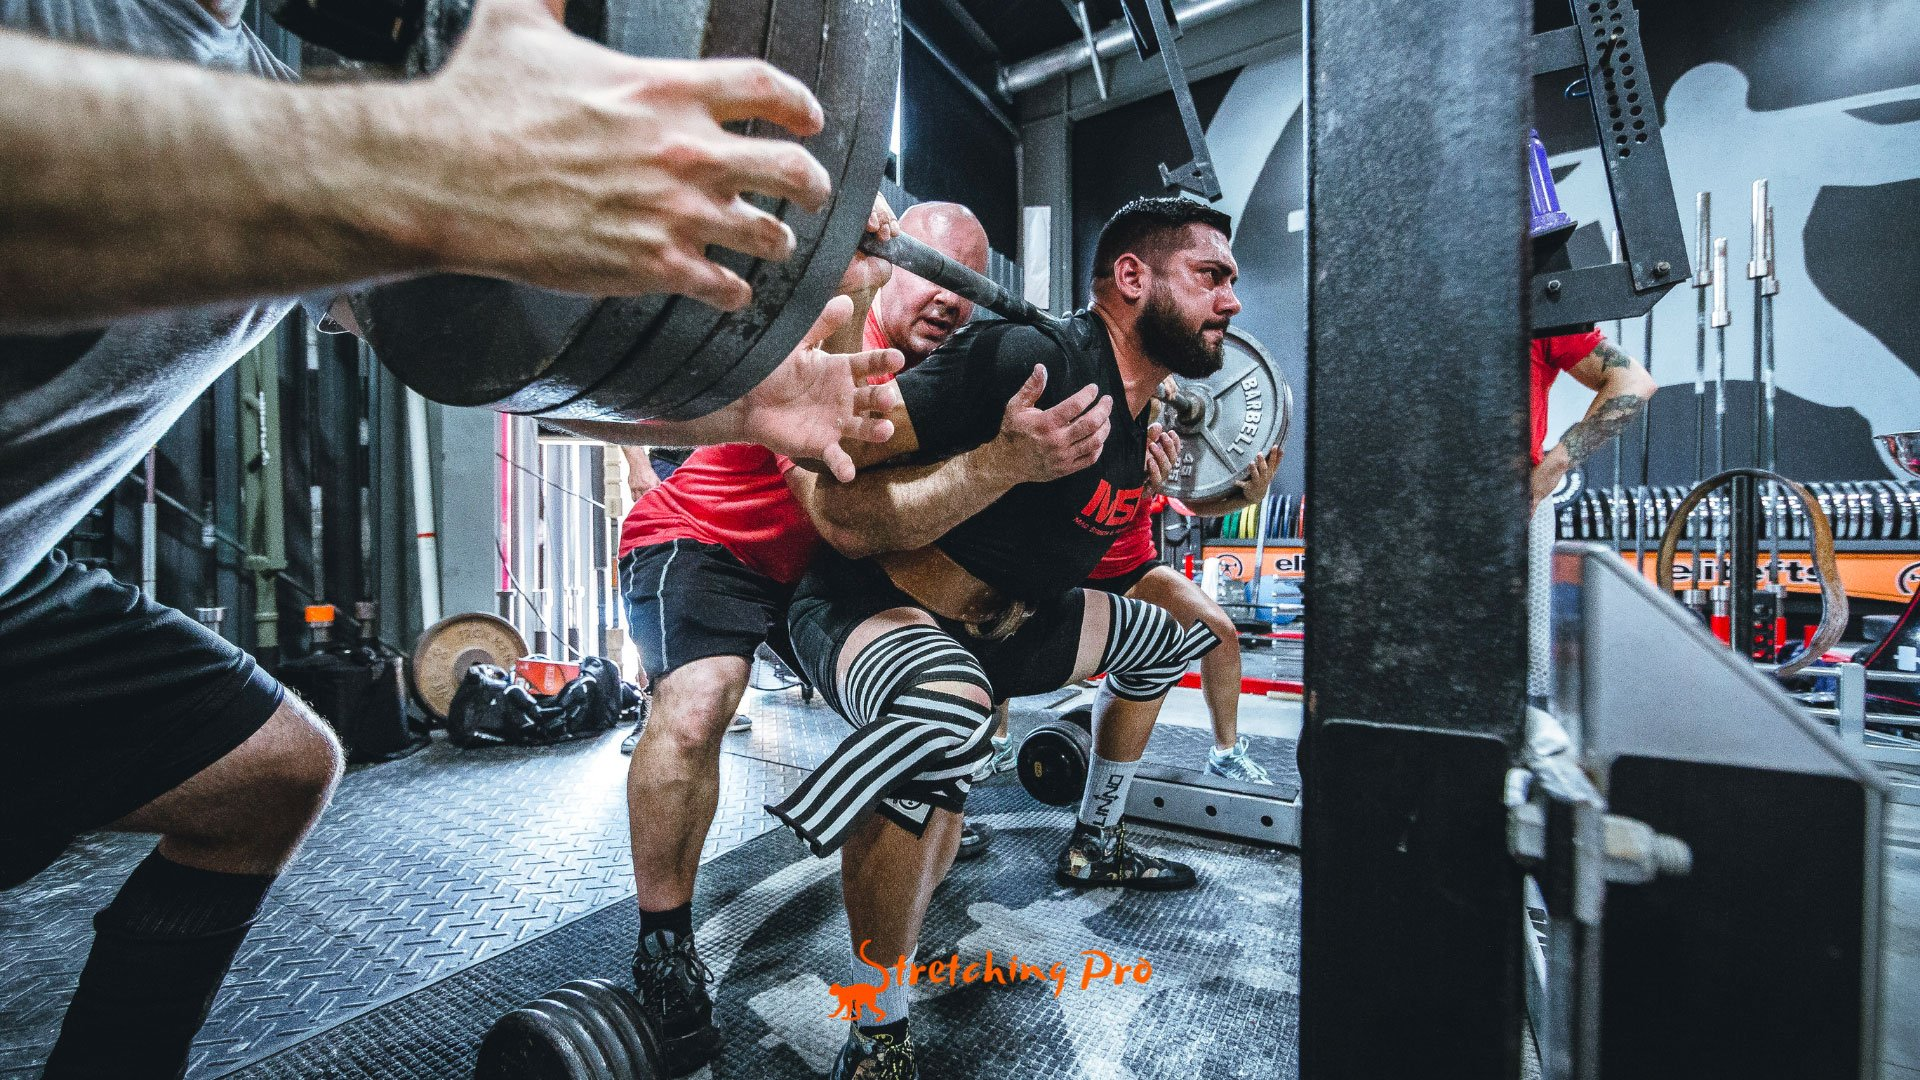 stretchingpro-étirements-powerlifting-squat